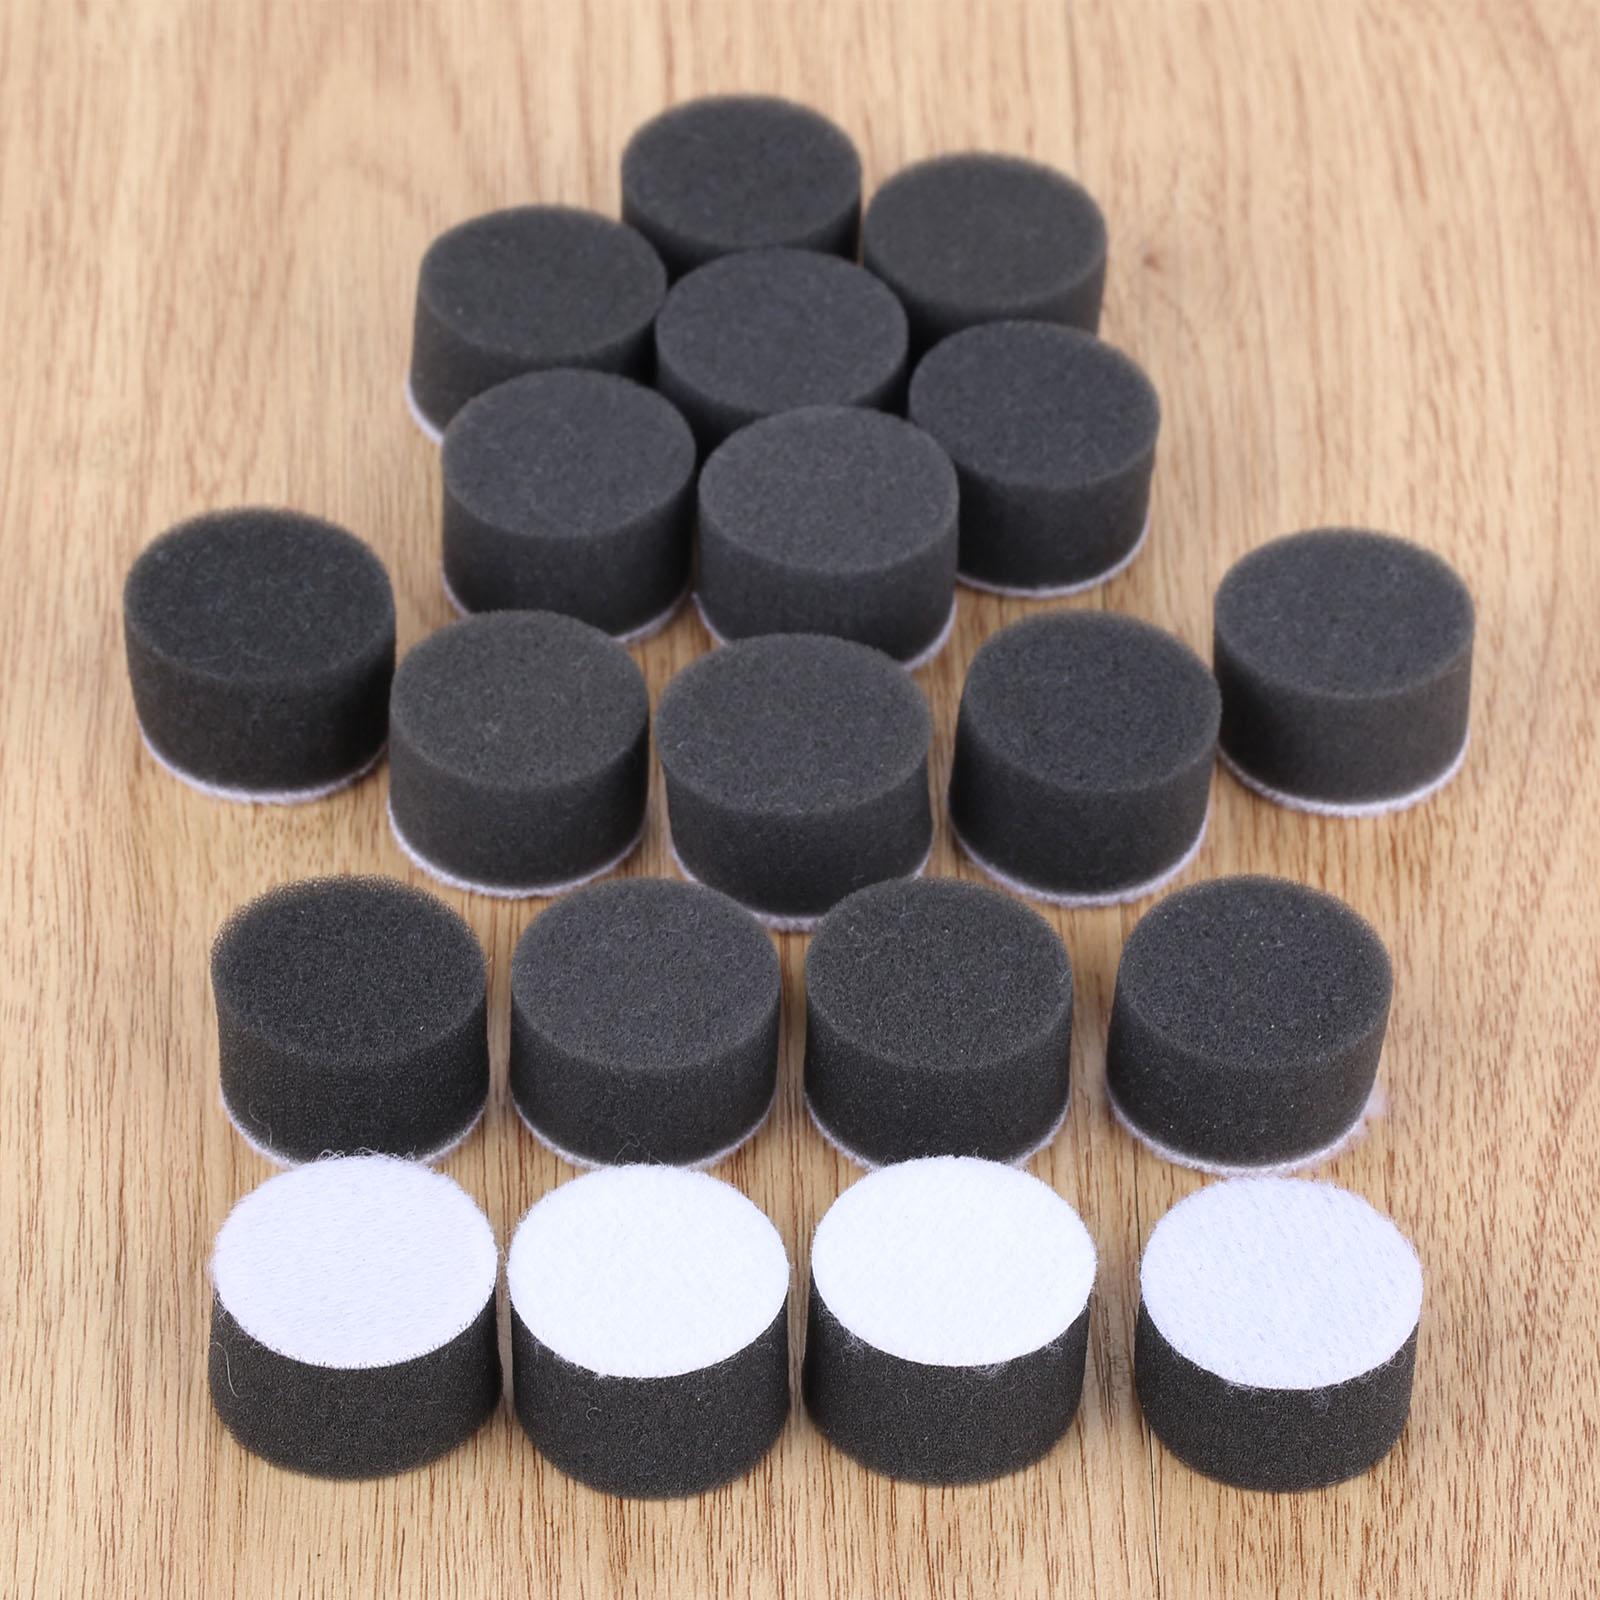 DRELD 20Pcs 1 Inch Sponge Polishing Buffing Pad Kit Hand Tool For Car Polisher Wax Buffer Car Polishing Pad Cleaning Tool Black